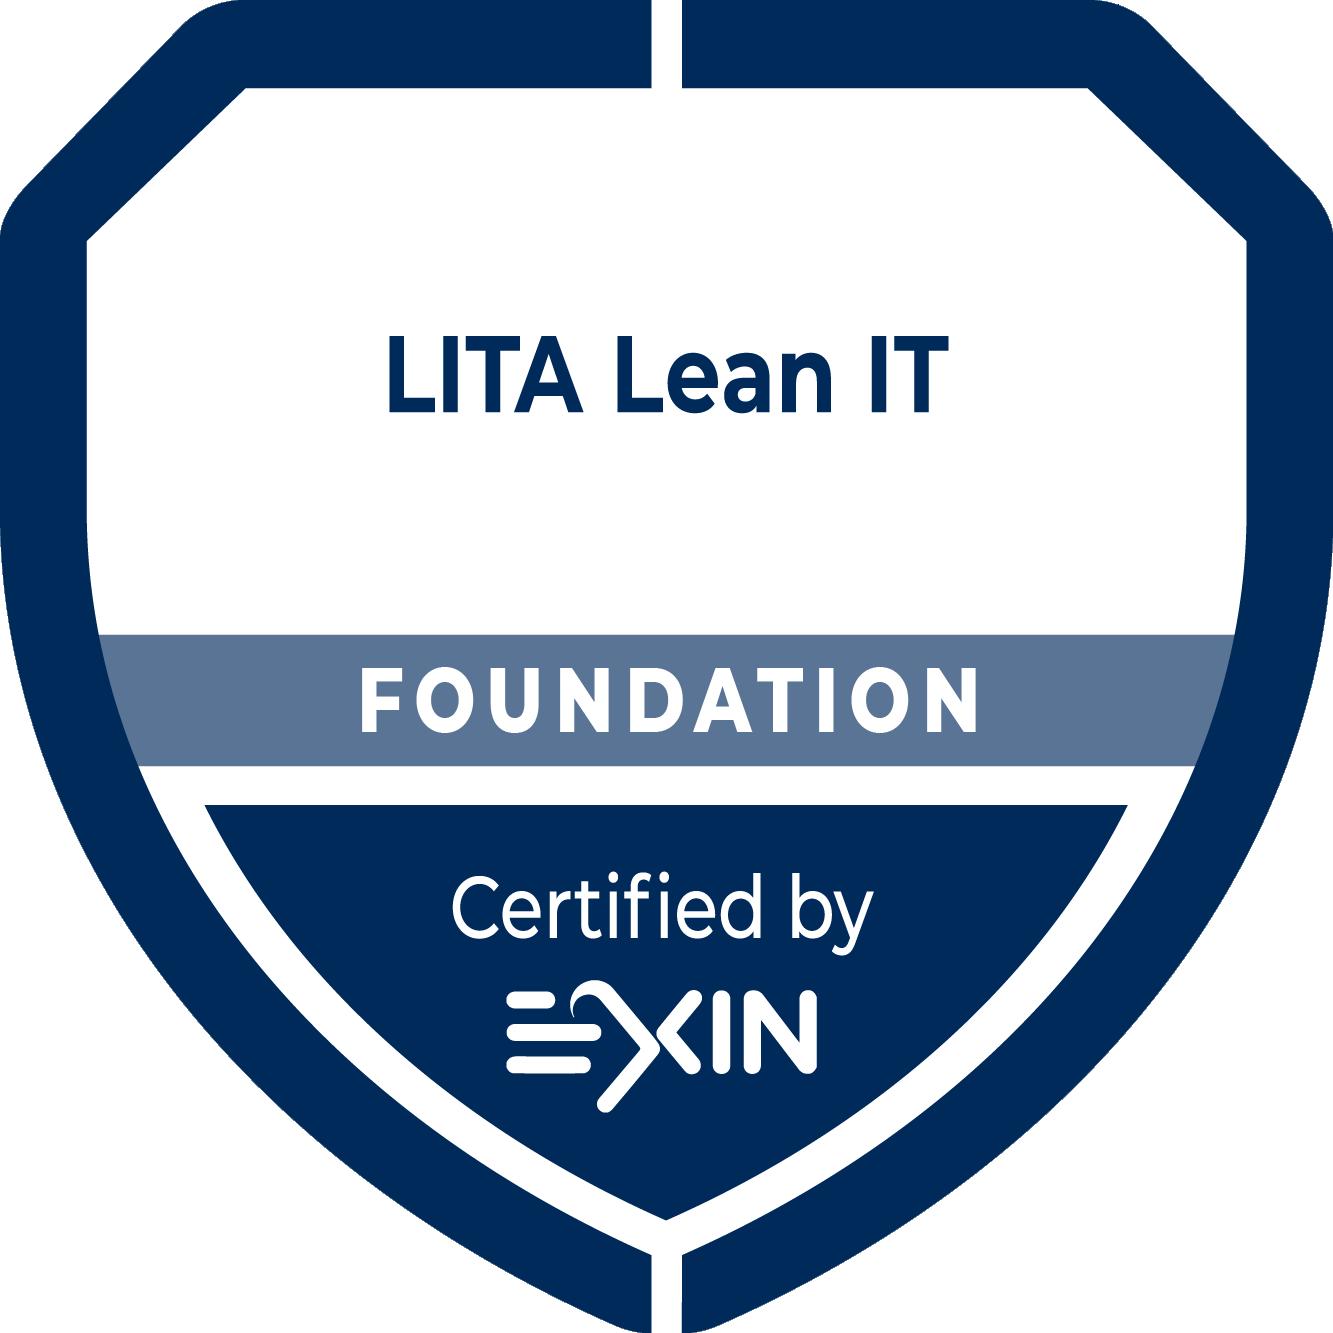 LITA - Lean IT Foundation